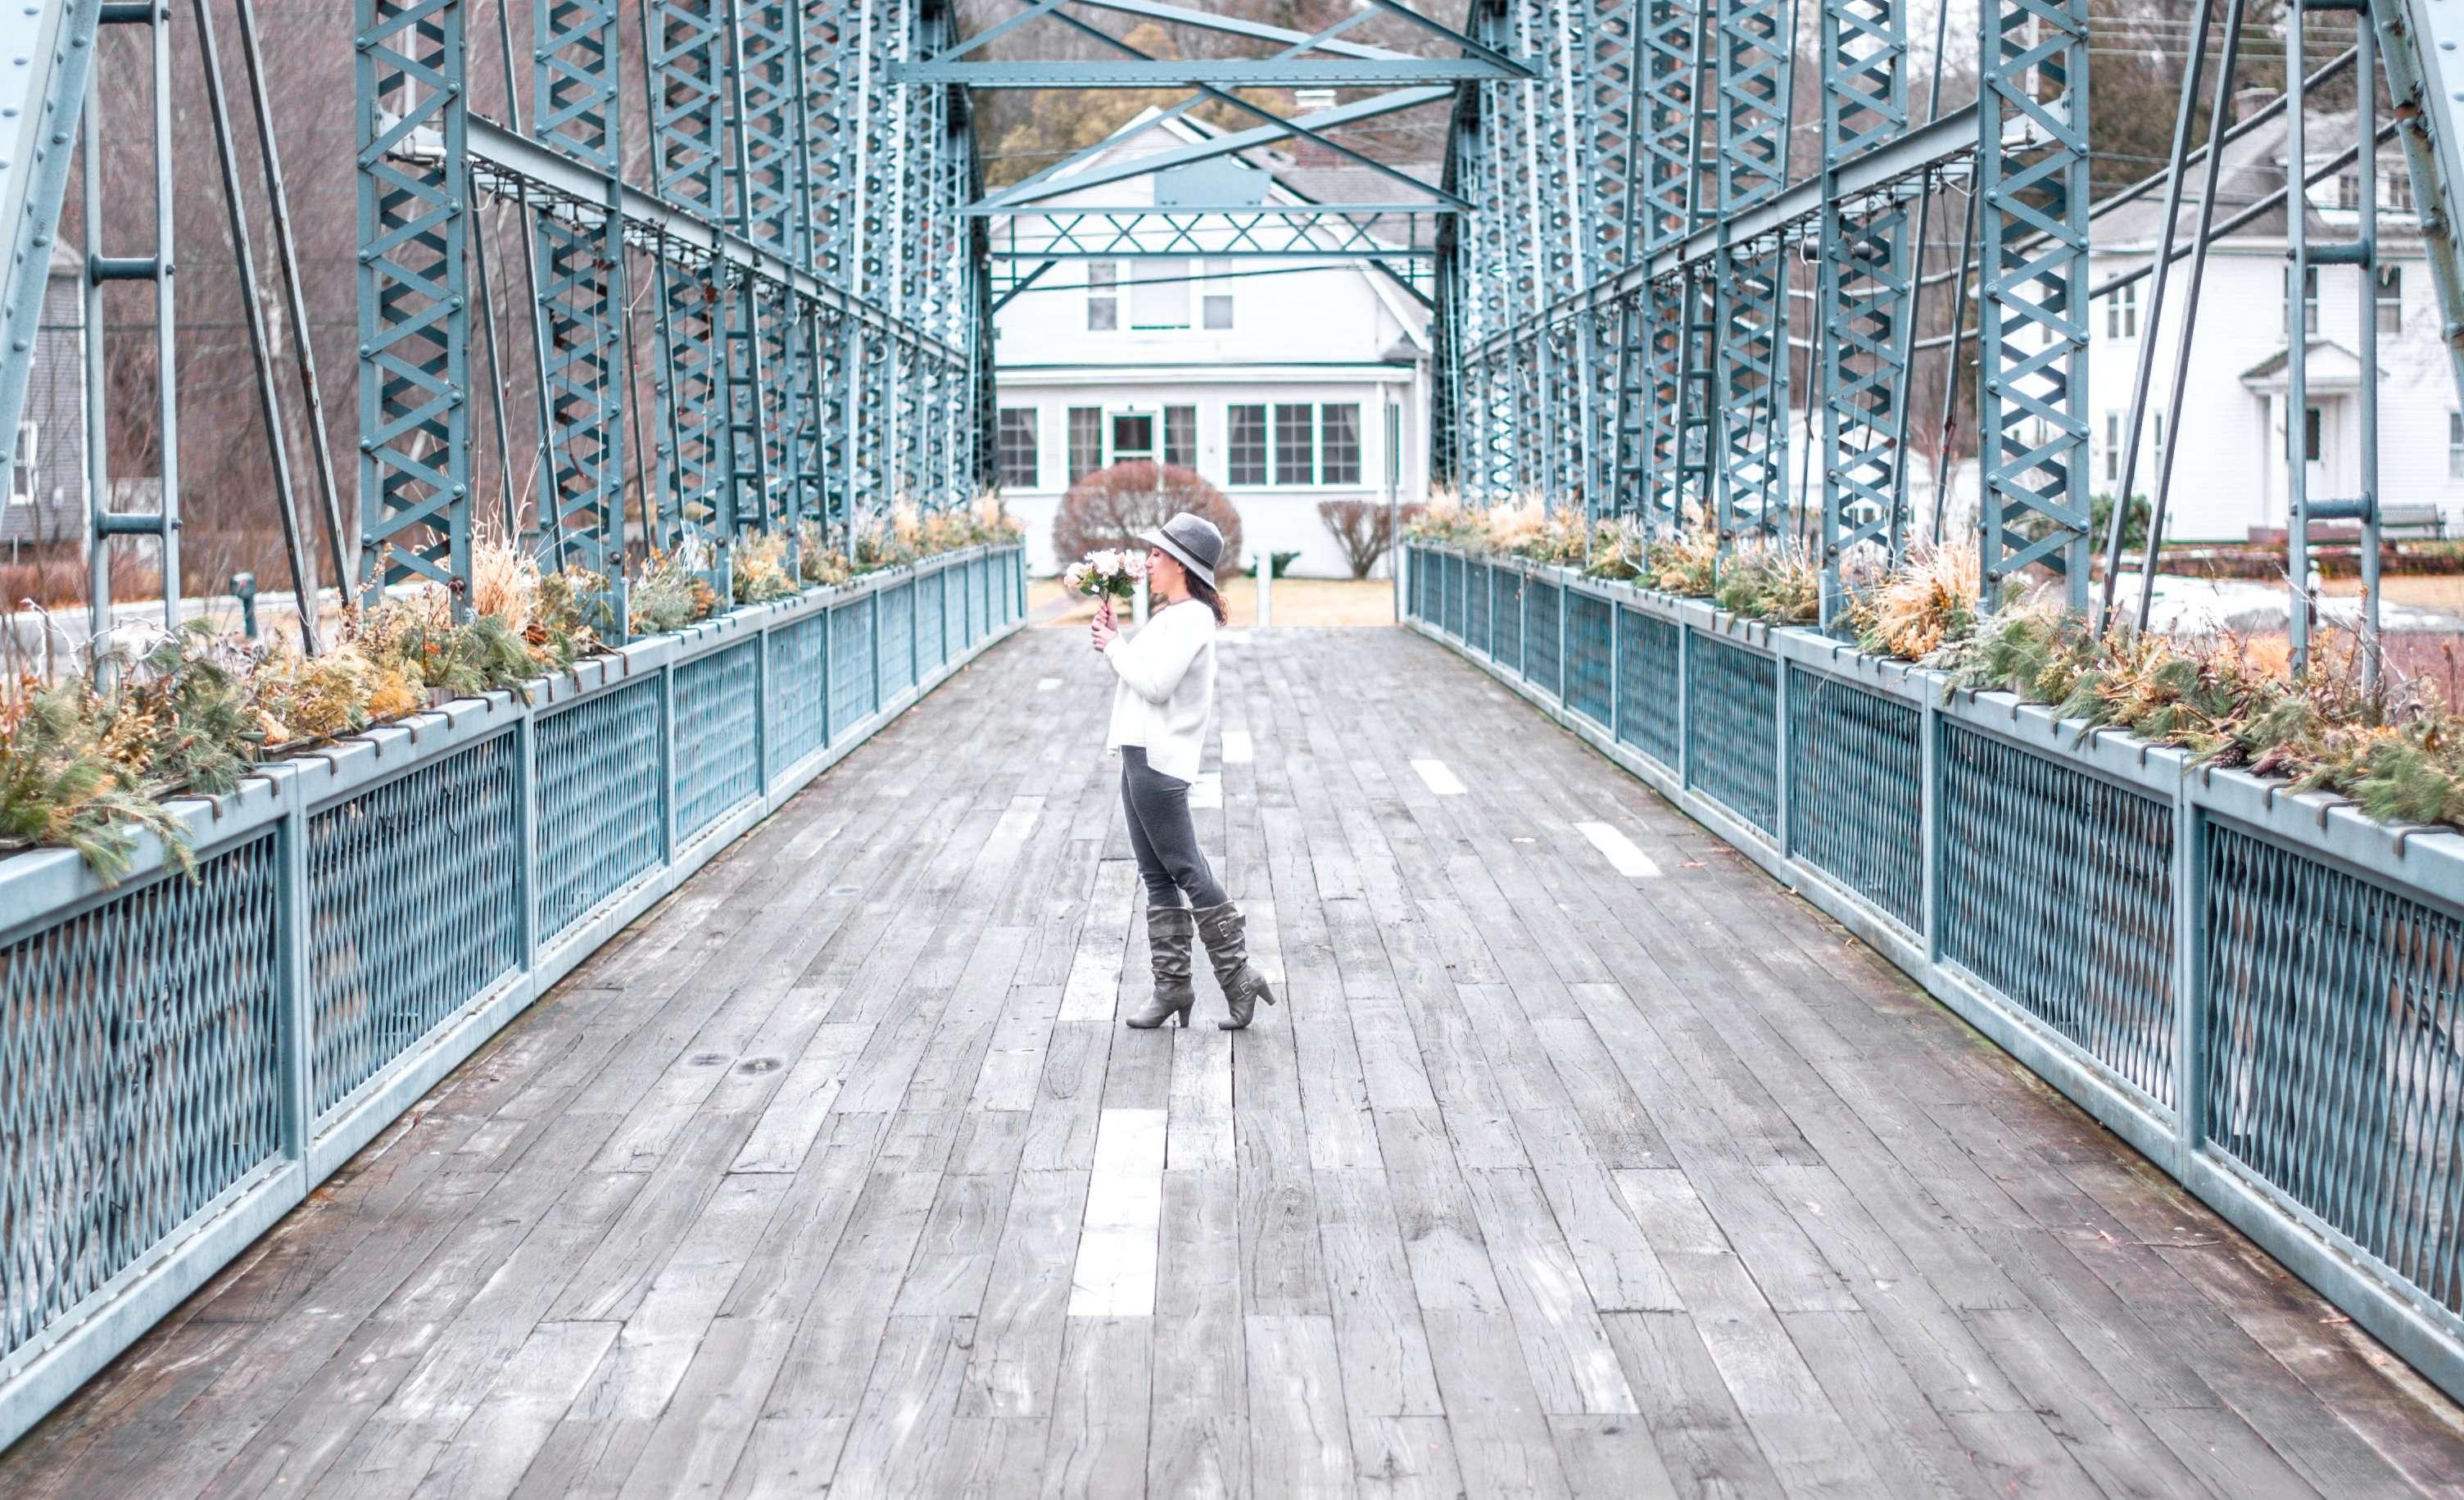 Dreaming of springtime at The Old Drake Hill Flower Bridge